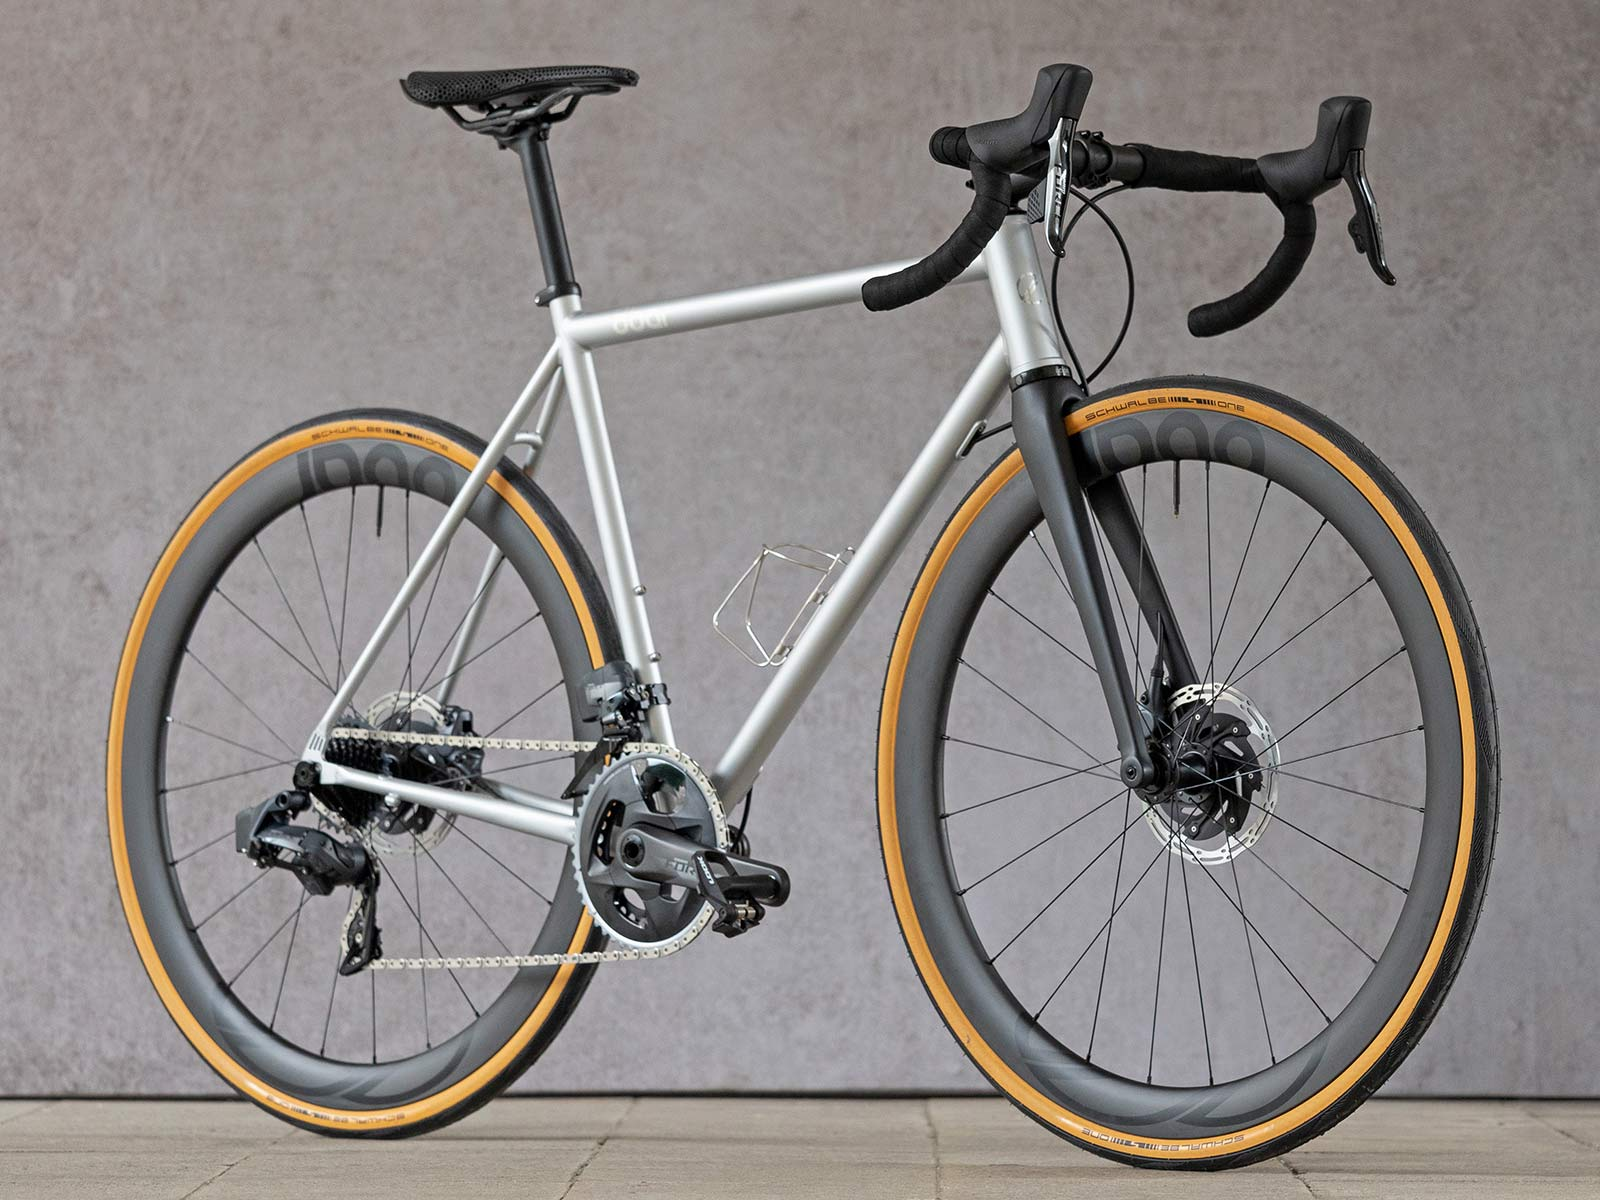 8bar Kronprinz Steel v1 affordable modern disc brake road bike, photo by Stefan Haehnel, angled